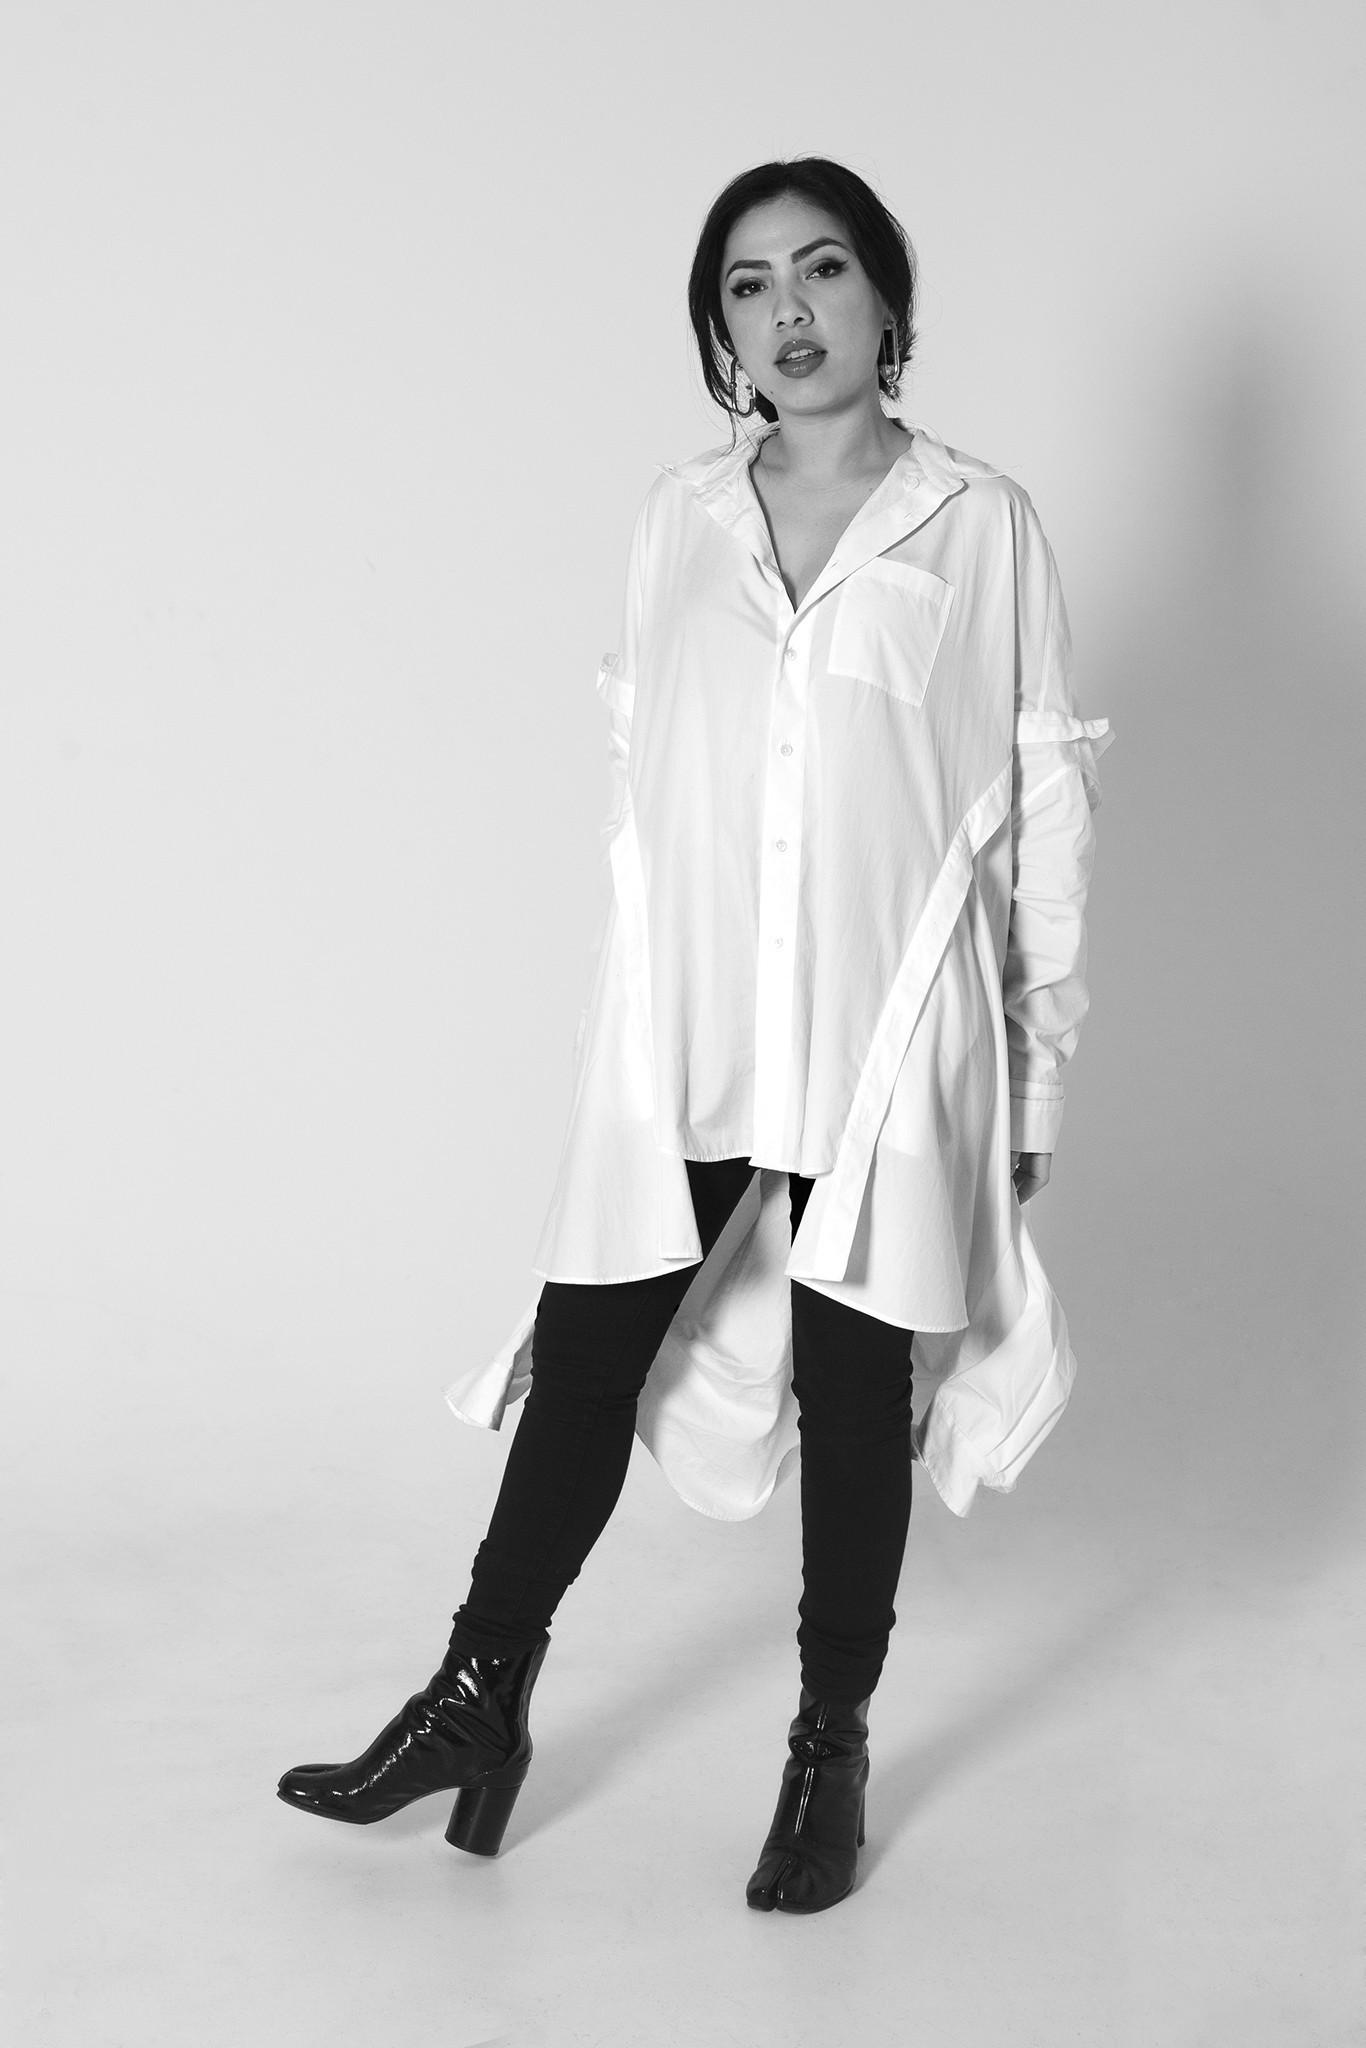 Dianne Garcia portrait